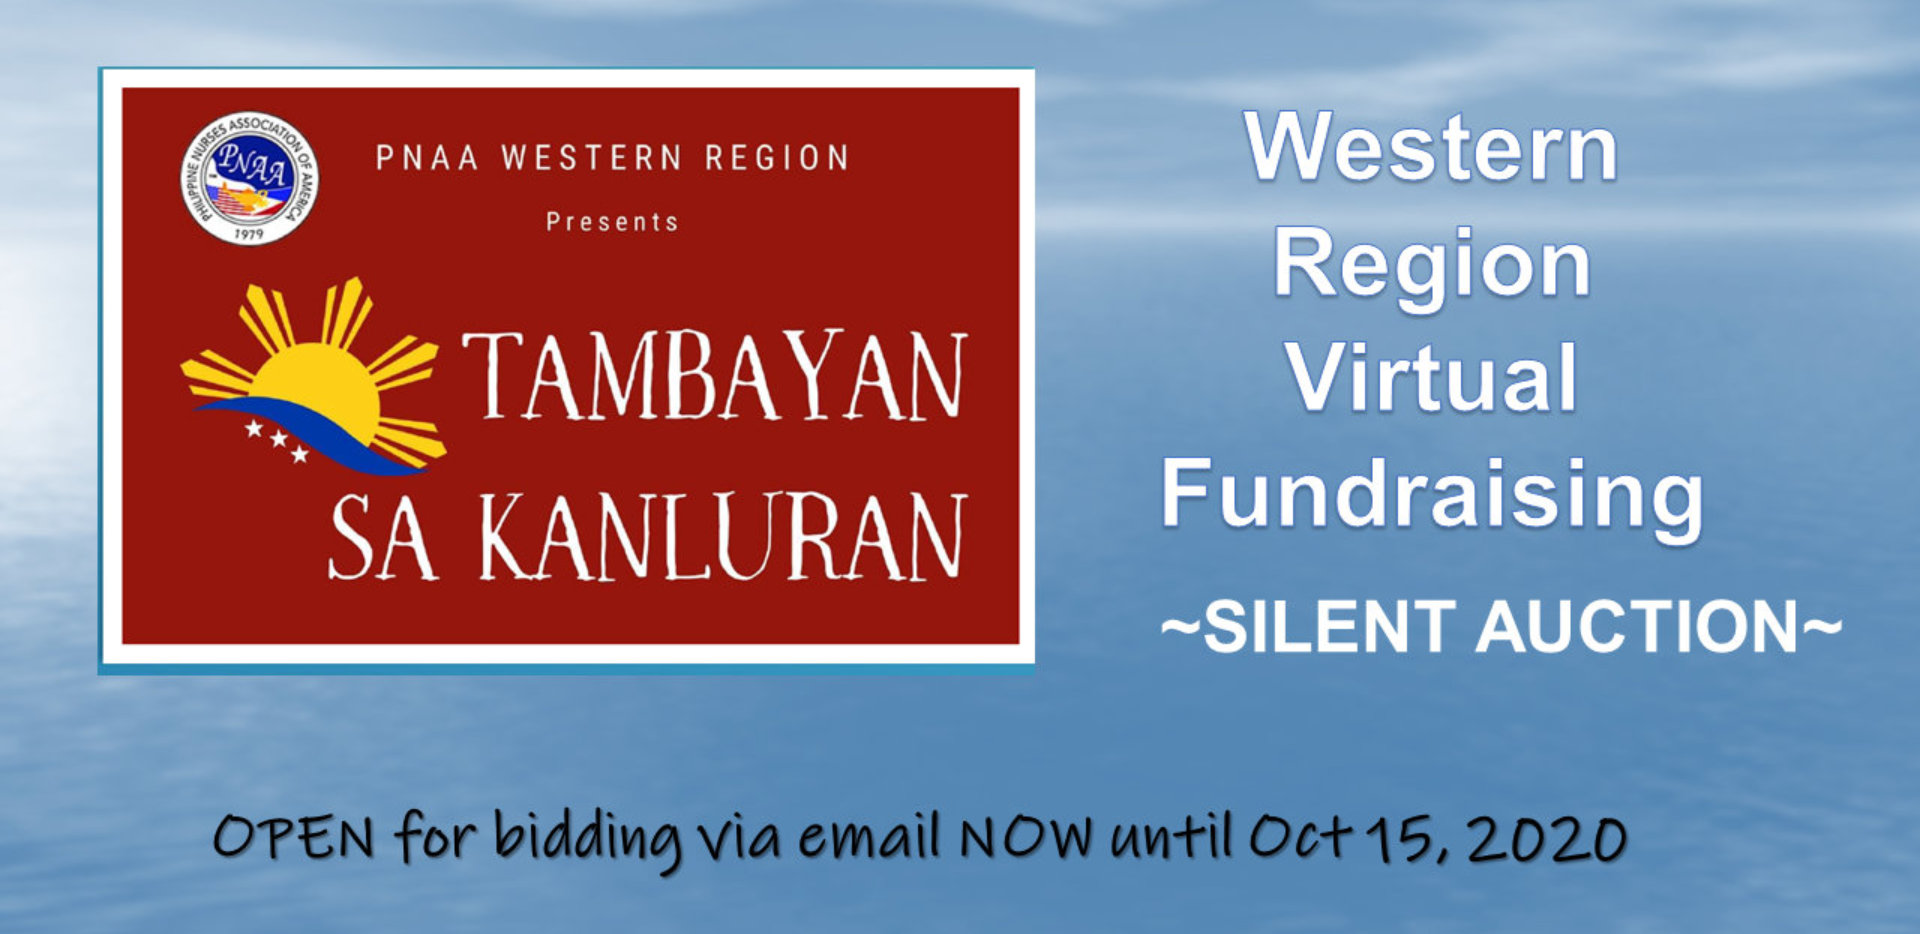 banner for fundraising